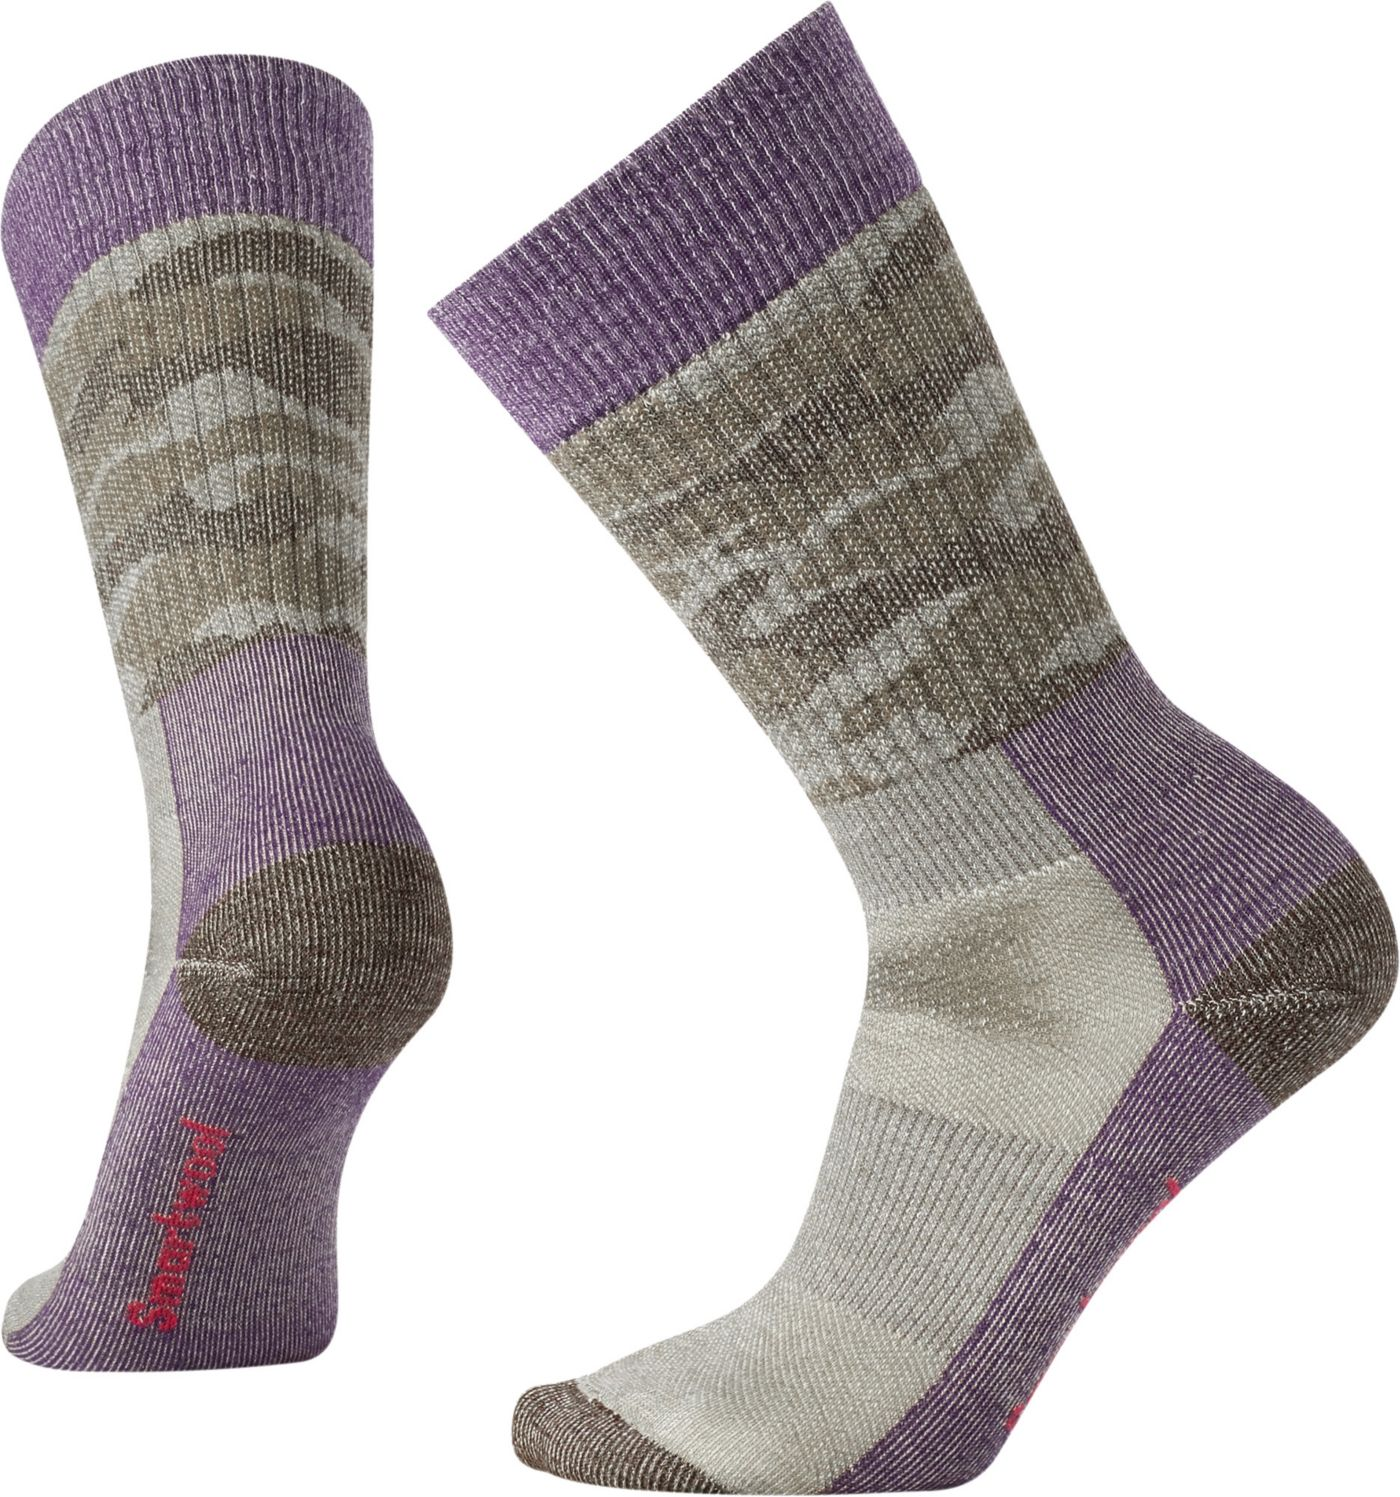 Smartwool Women's Hunt Camo Medium Crew Socks